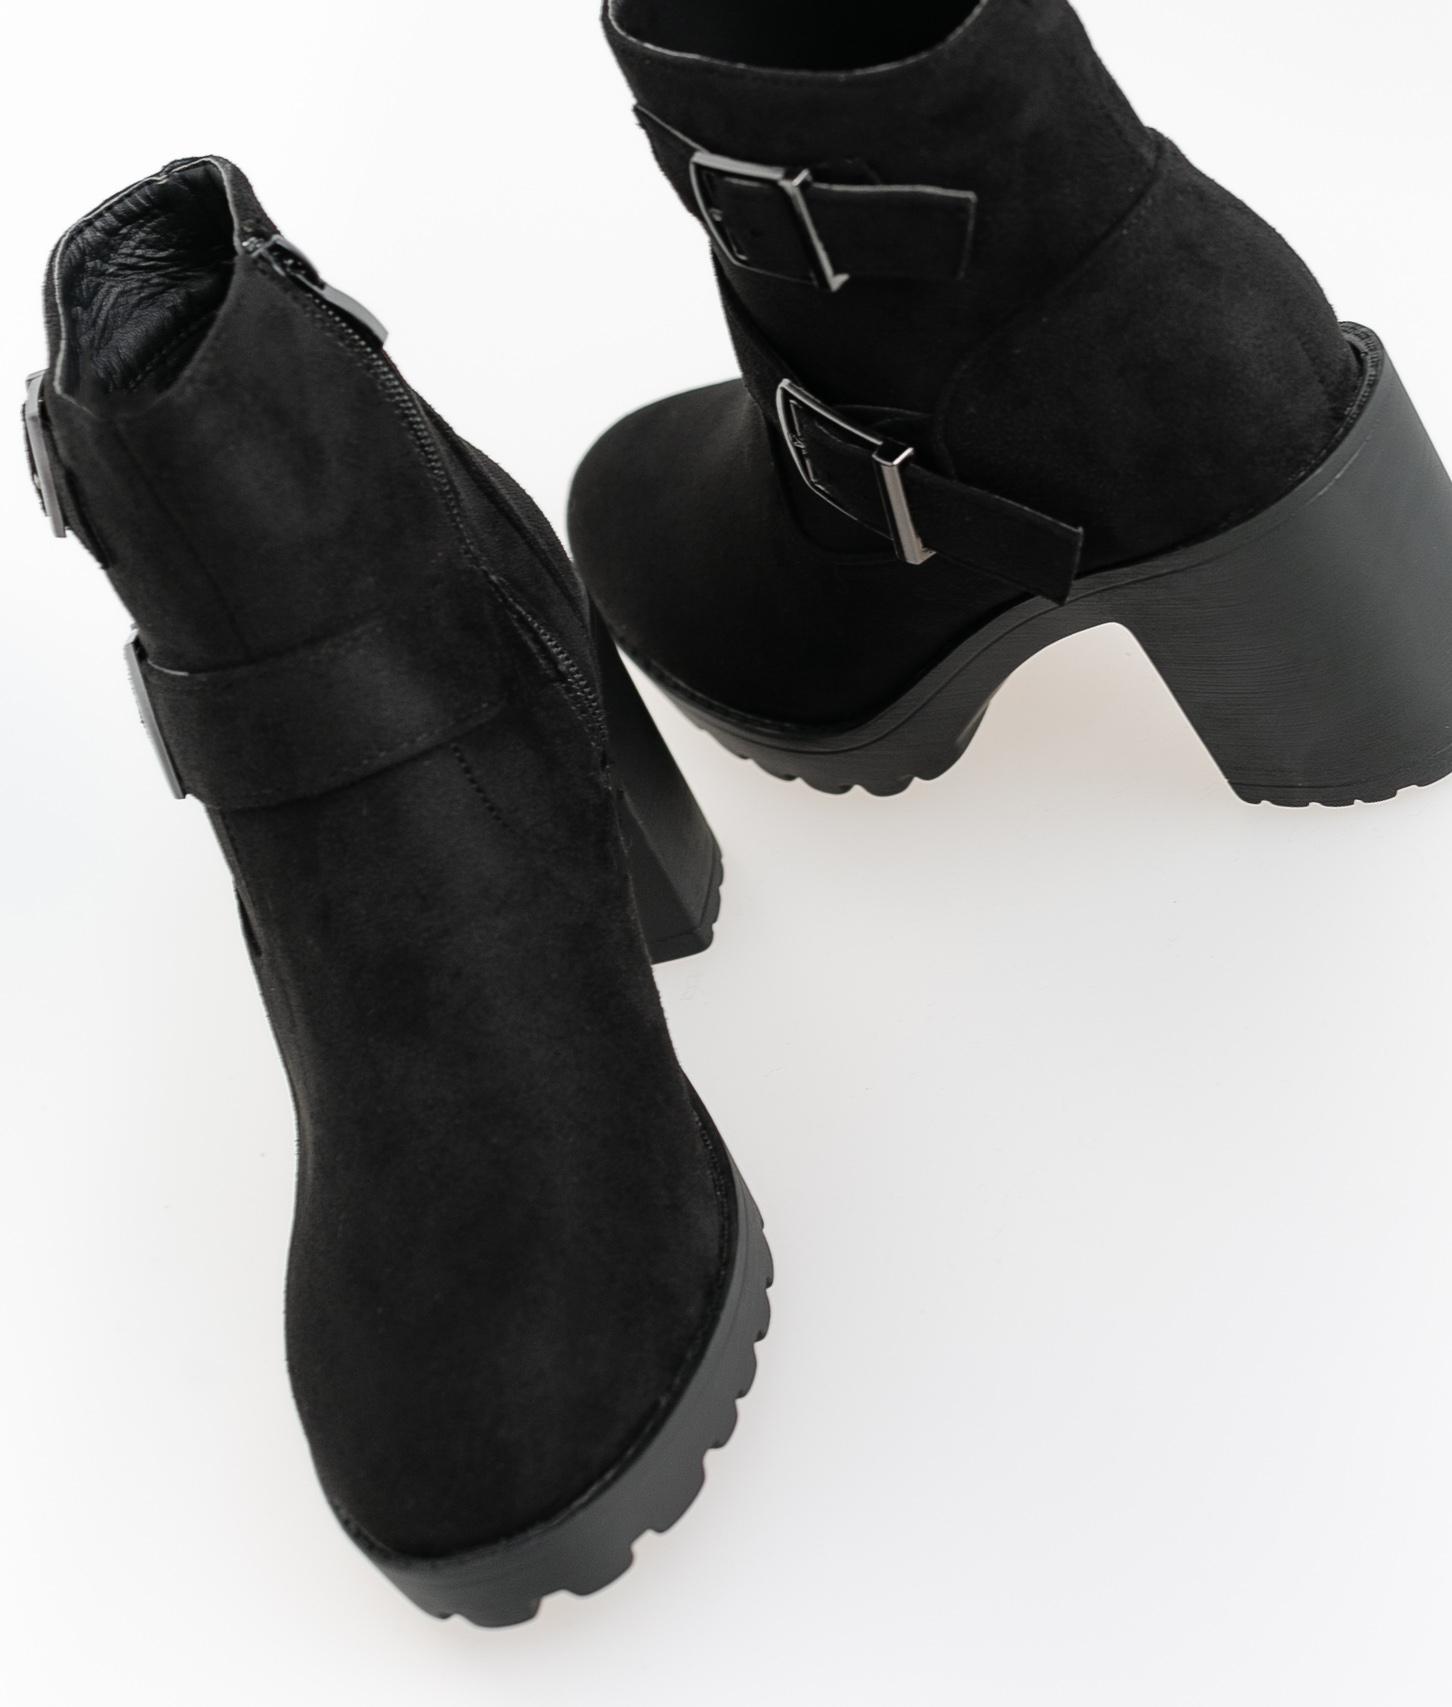 Rupert Low Boot - Black